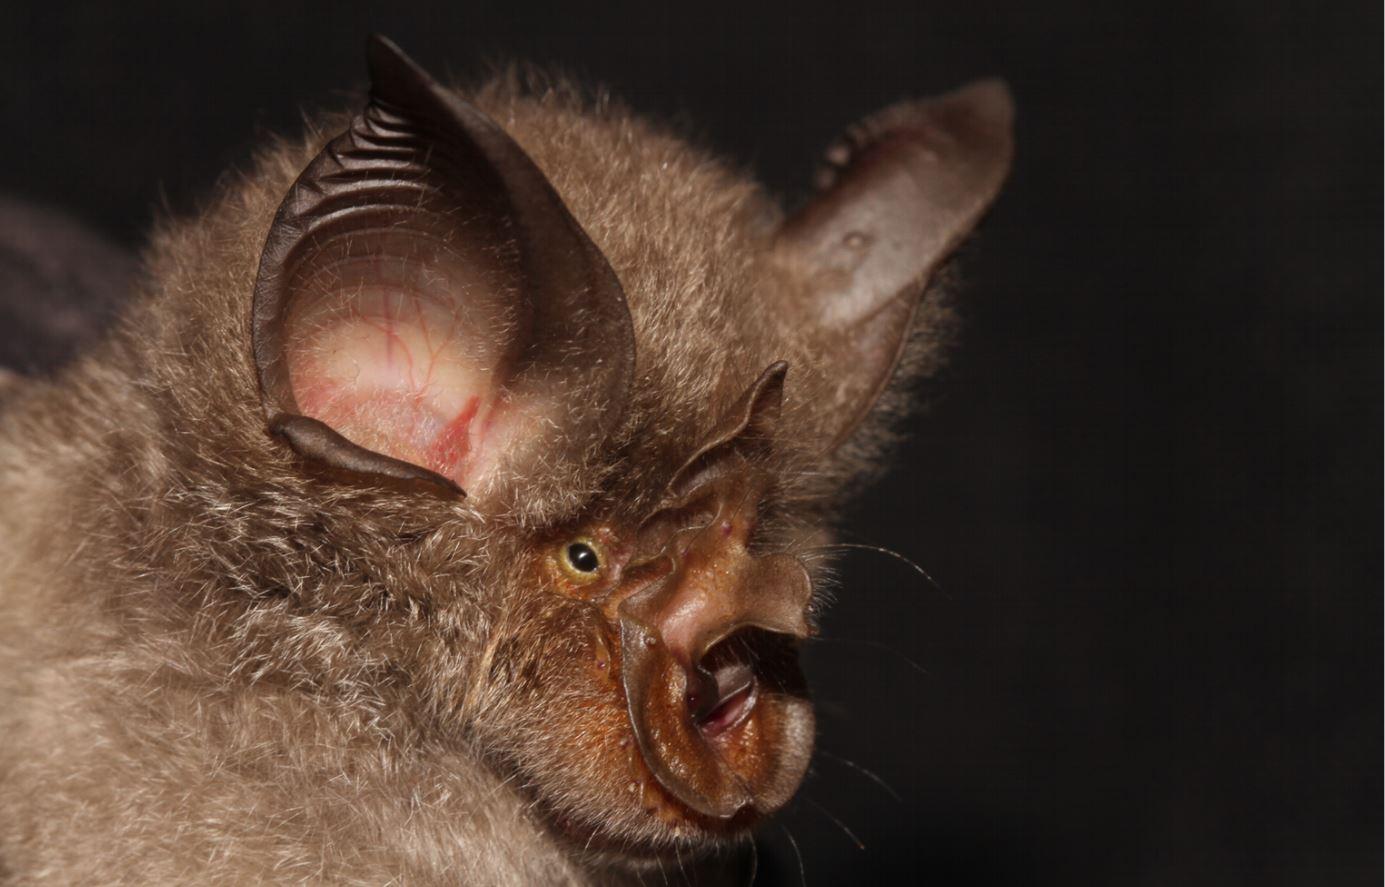 https://upload.wikimedia.org/wikipedia/commons/e/e8/Rhinolophus_smithersi.jpg